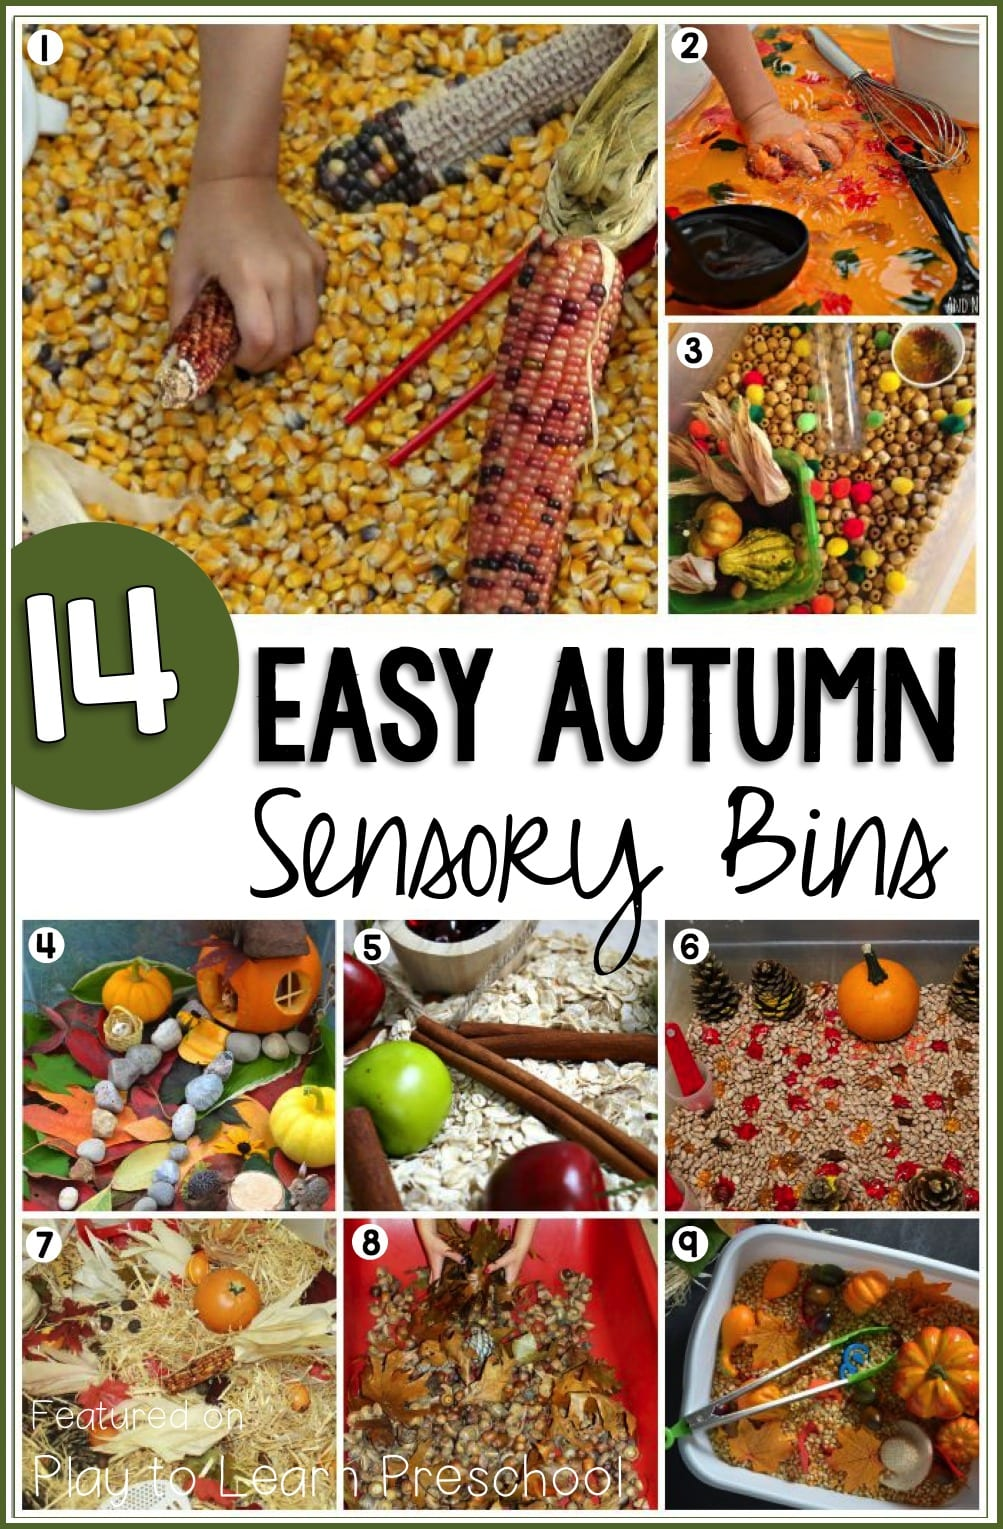 Autumn Sensory Bins